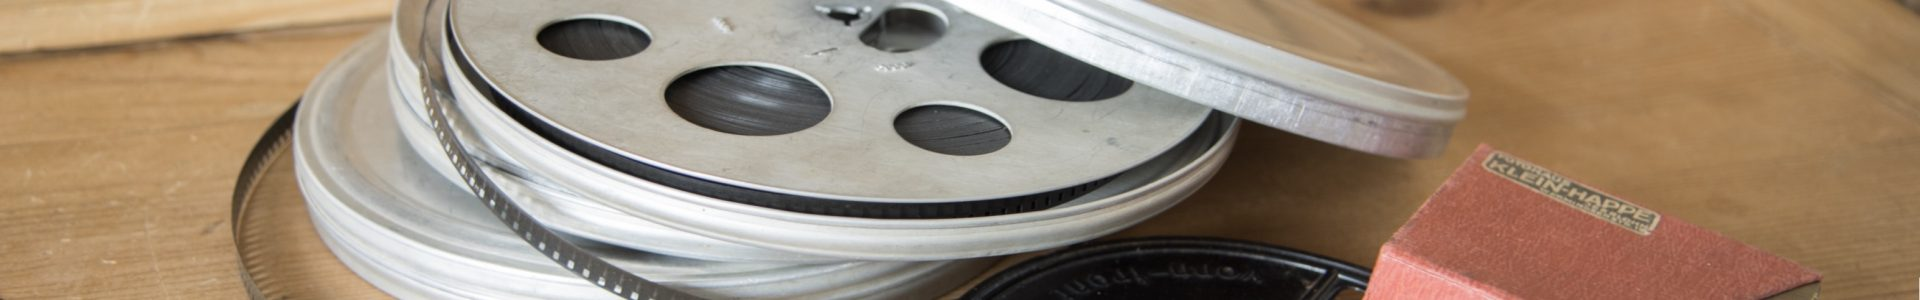 Interessante Filmbeiträge